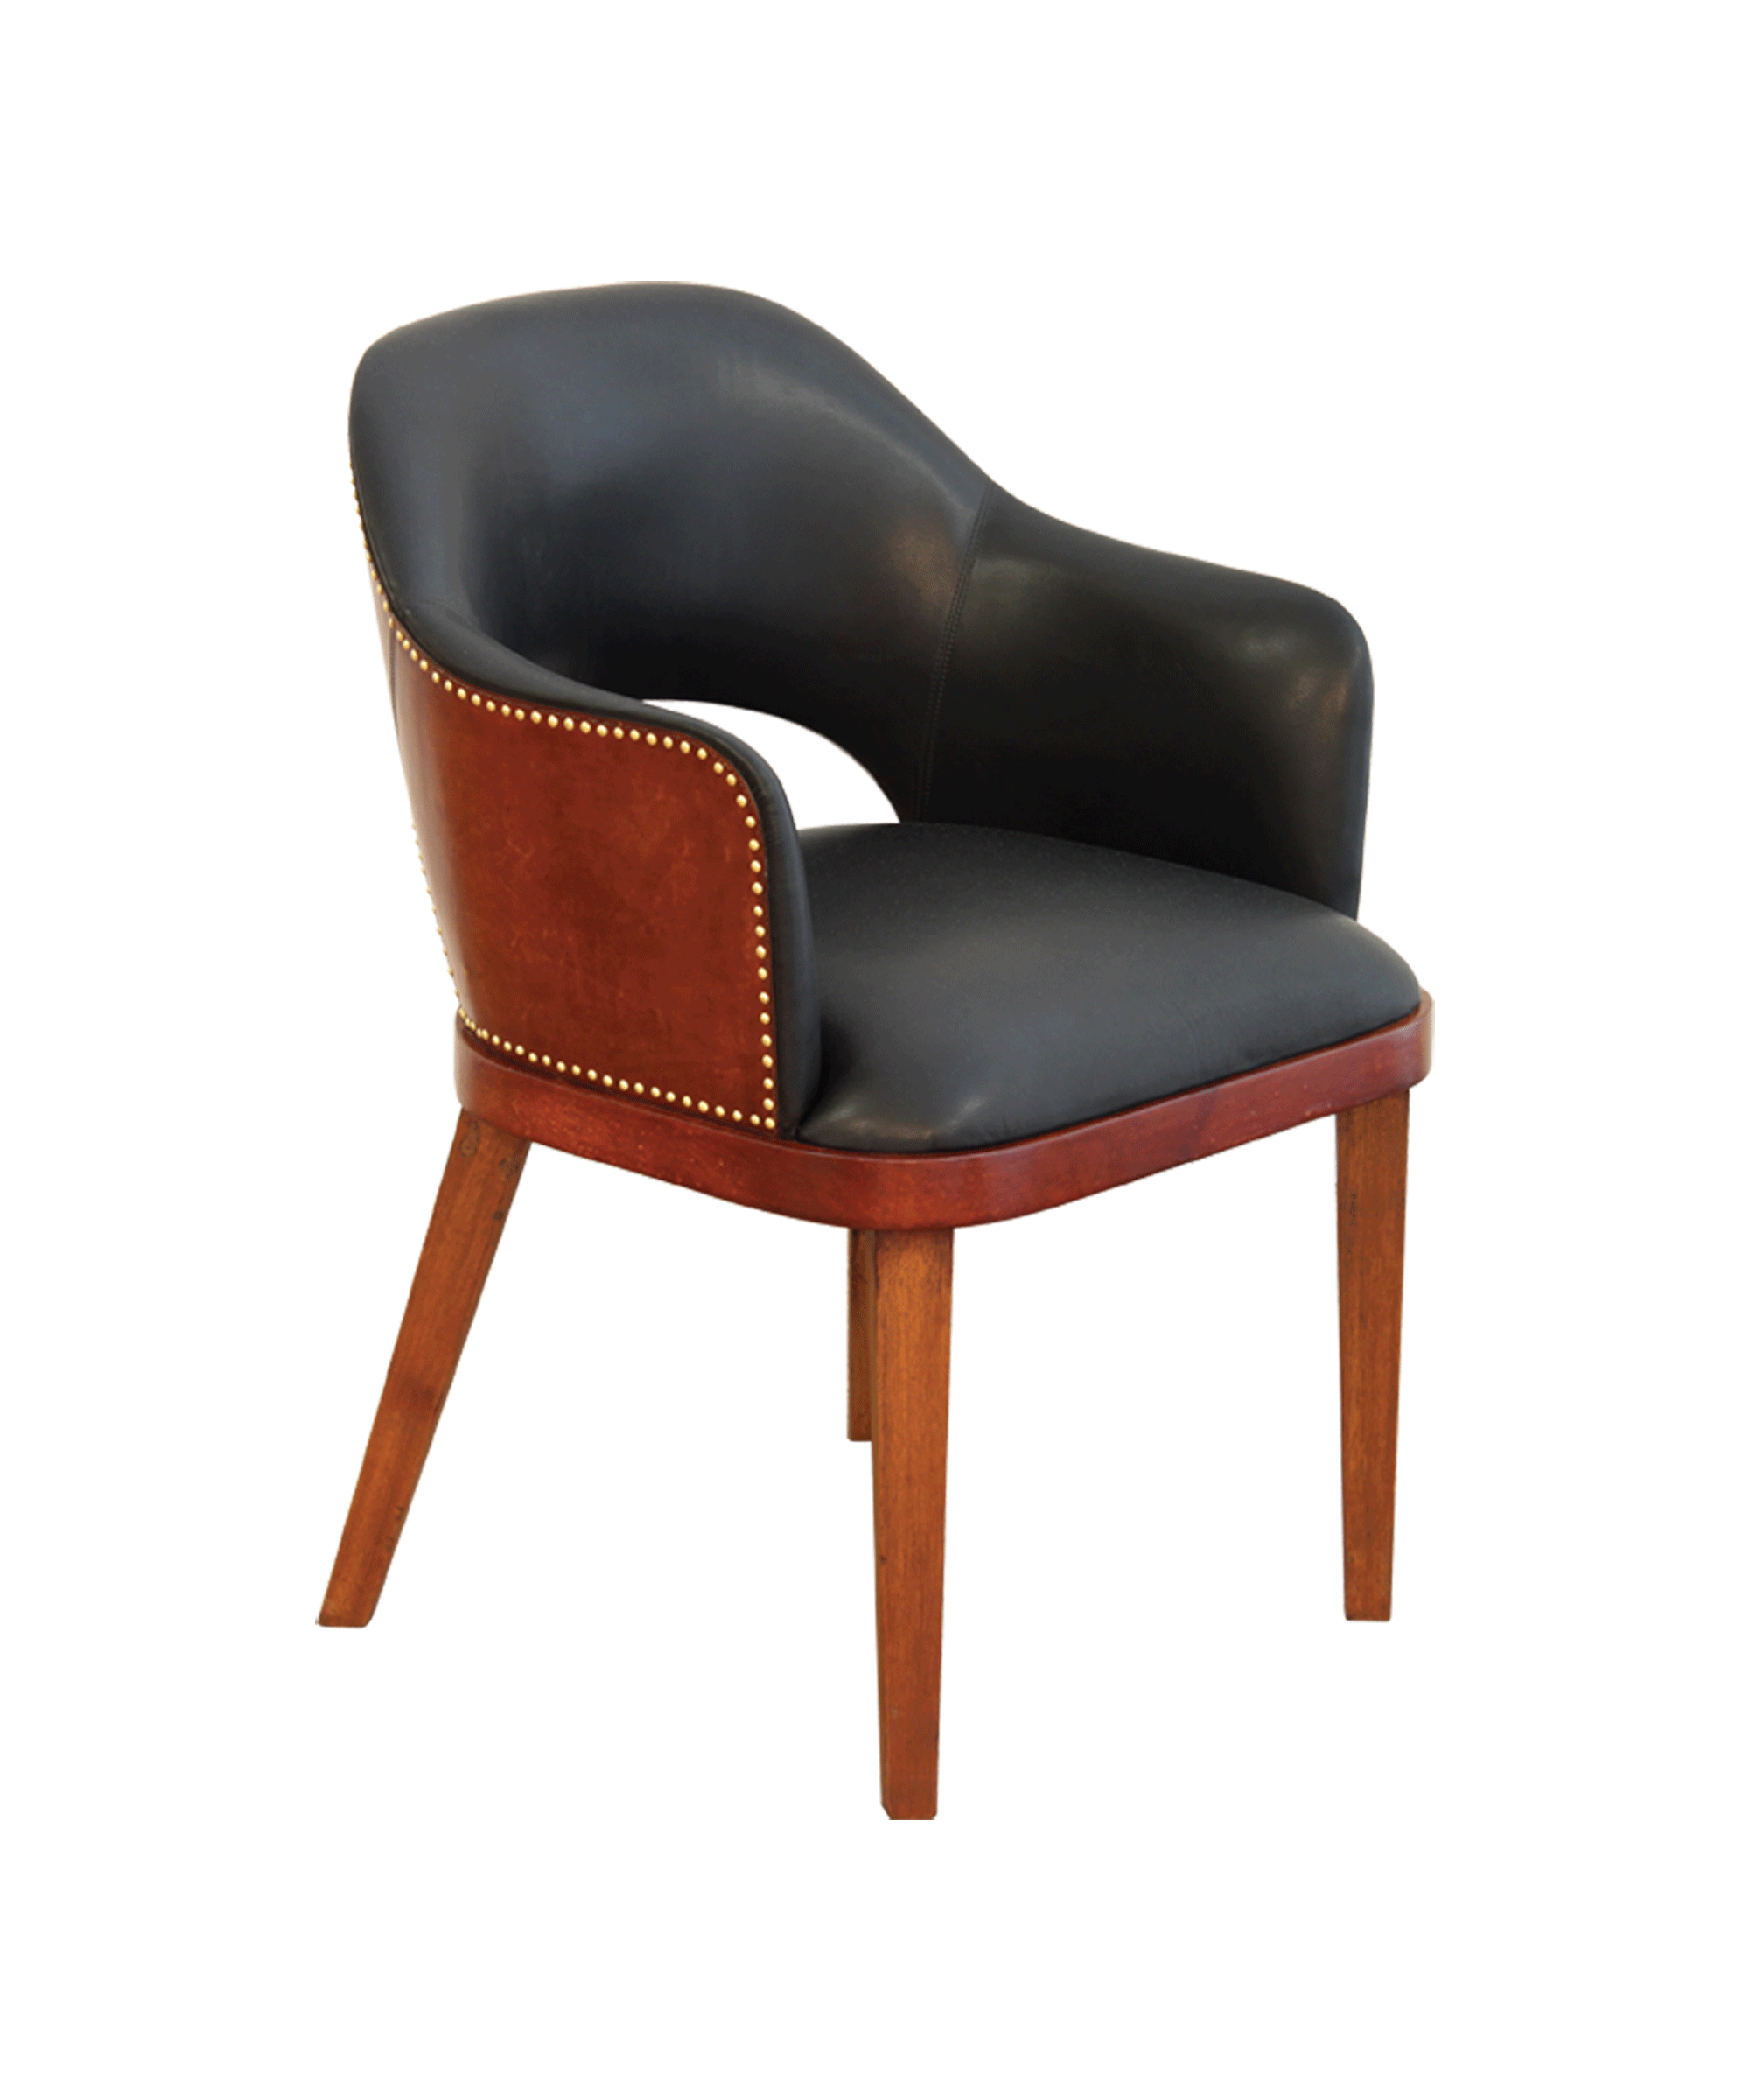 The Boss Bucket Chair   PortsideCafe   釣魚臺家具備選   Pinterest ...